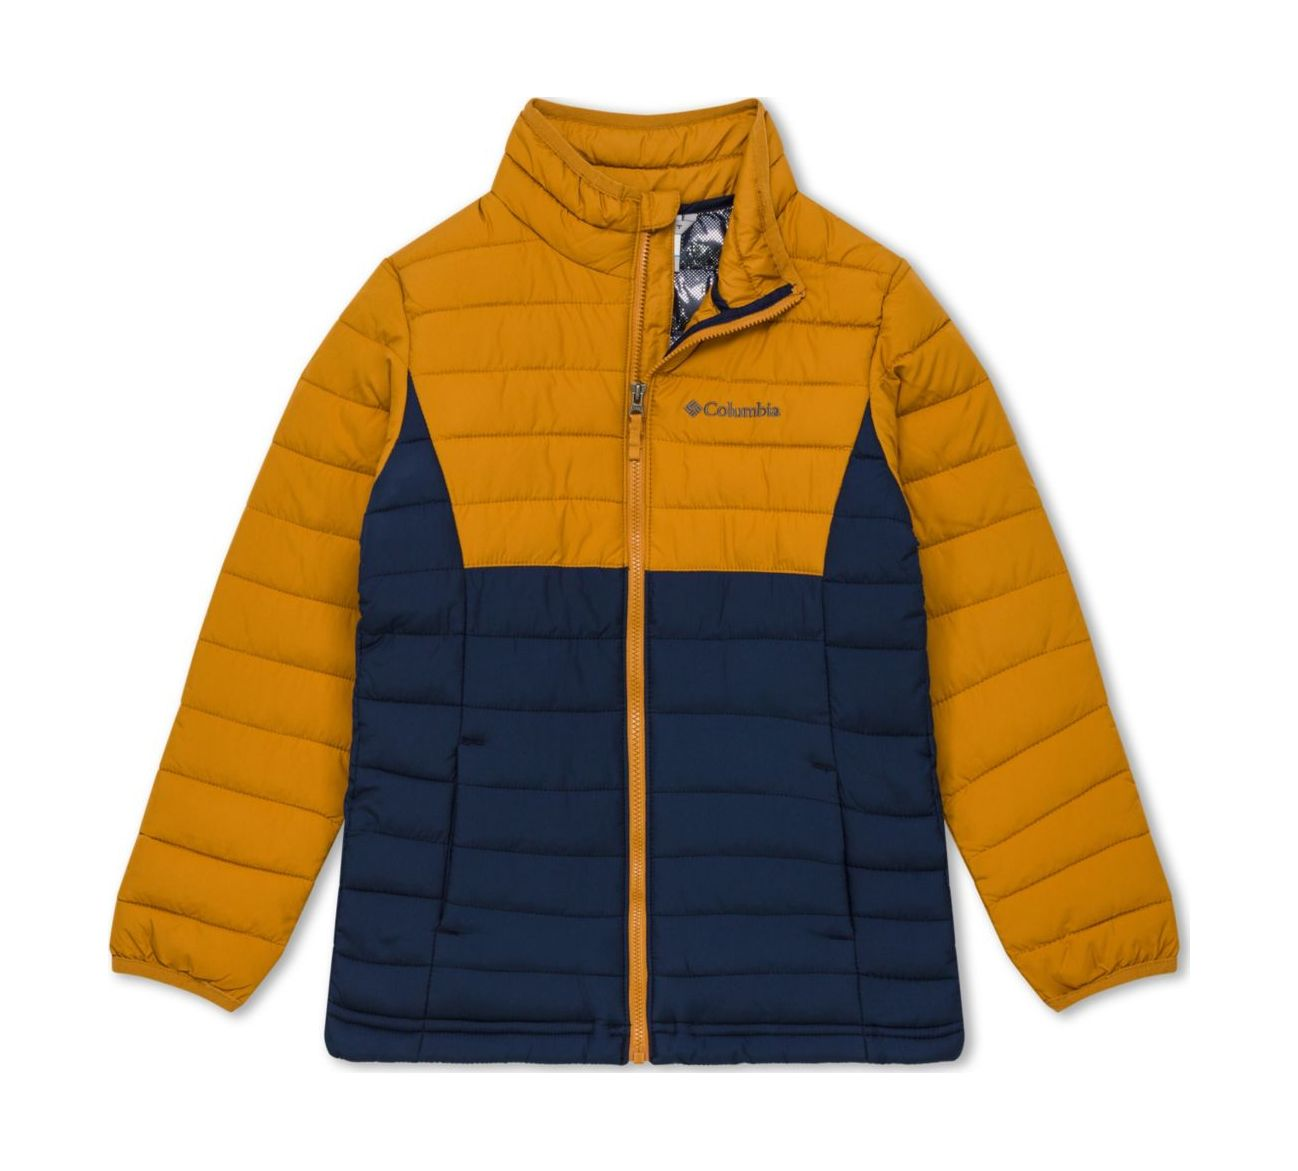 Columbia Powder Lite Boys Jacket Collegiate Navy/Canyon Gold 128